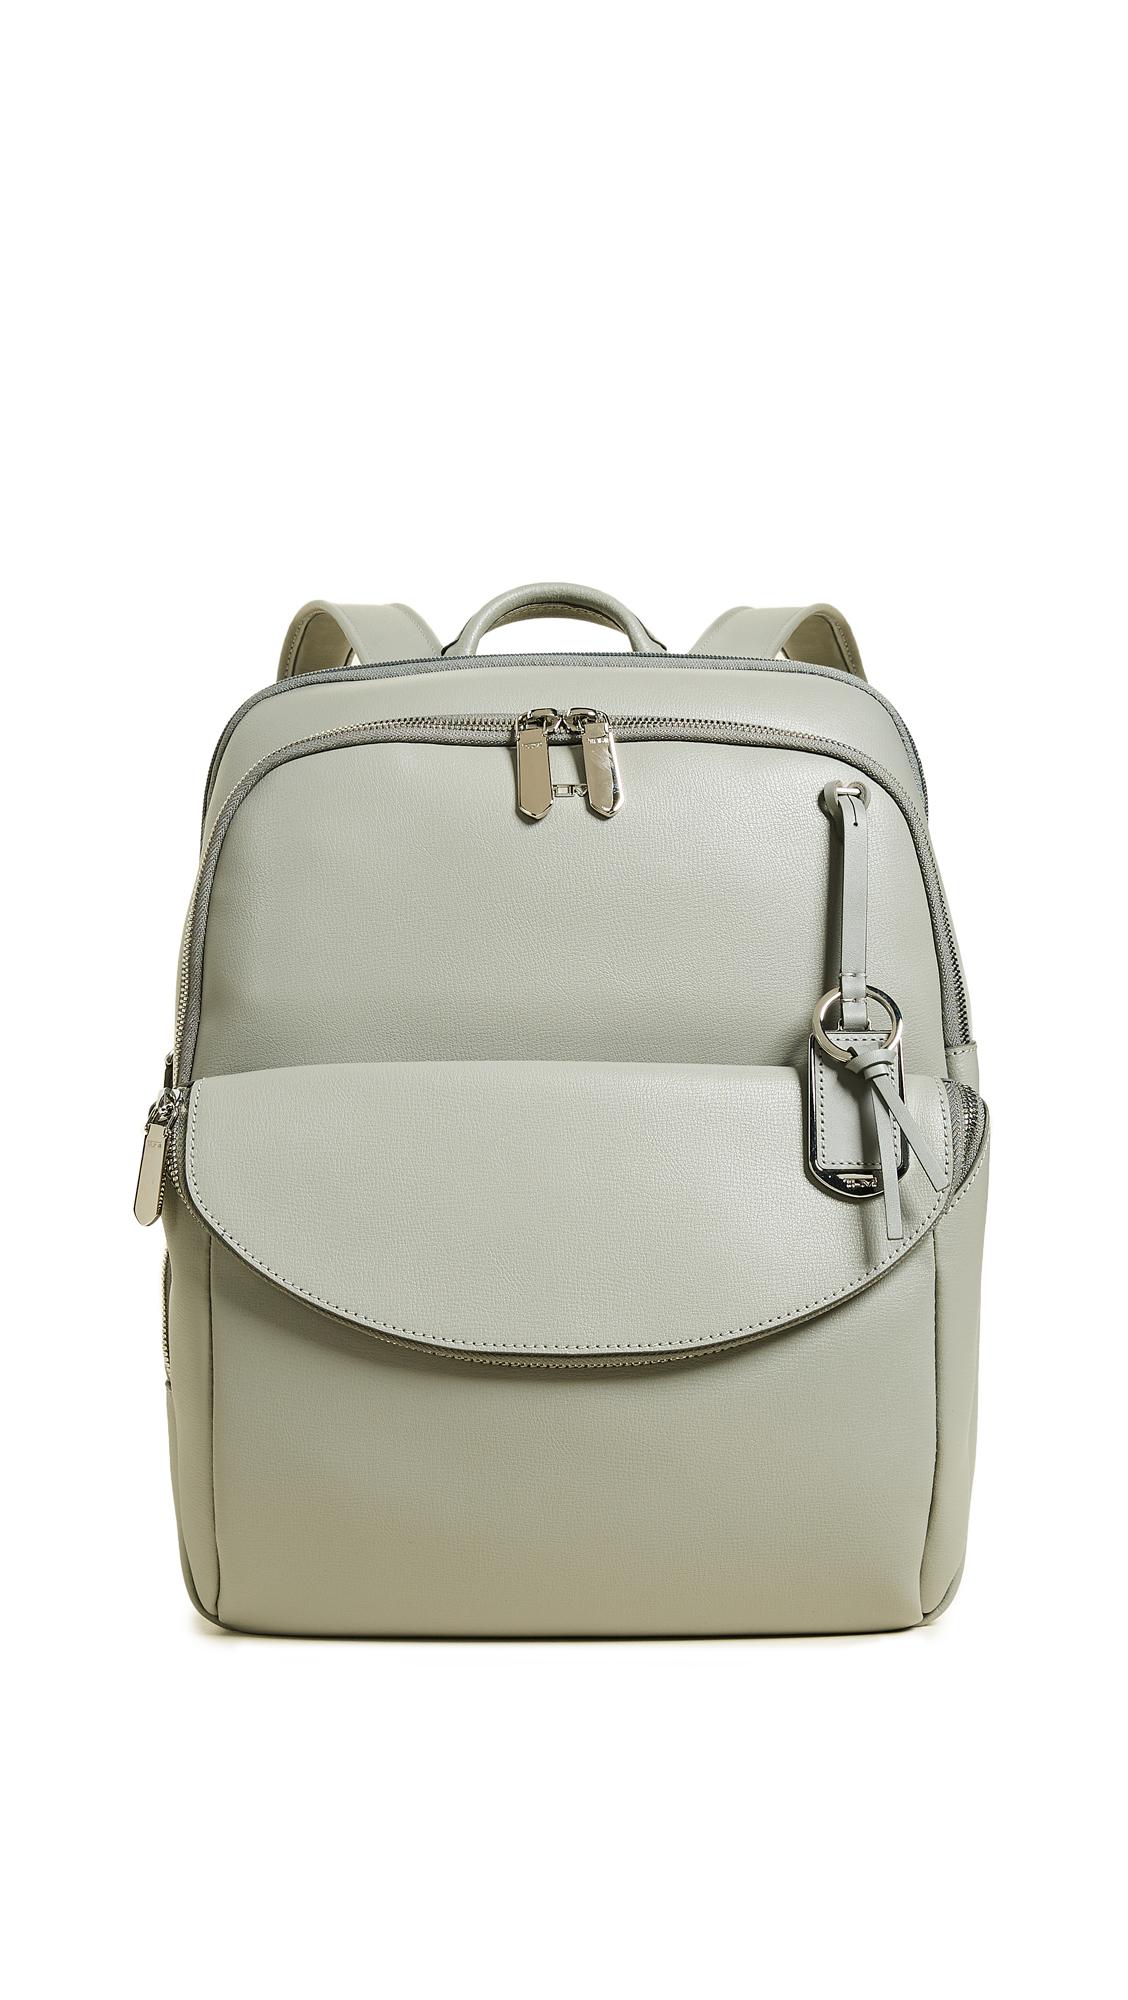 Tumi Hettie Backpack - Light Grey